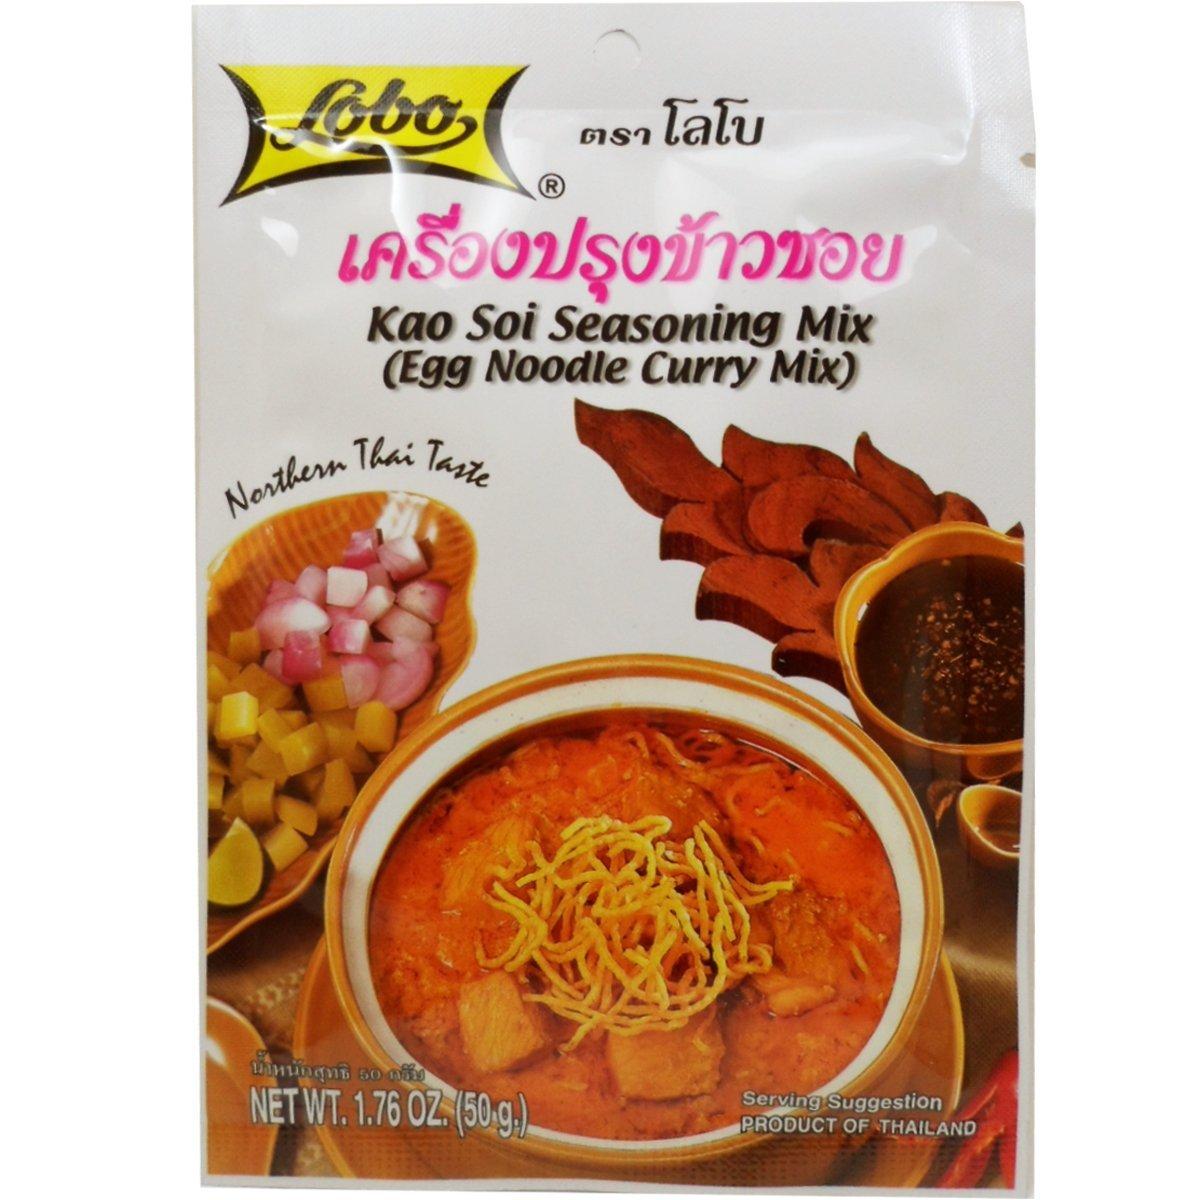 Lobo Kao Soi Seasoning Mix (Egg Noodle Curry Mix) Thai Herbal Food